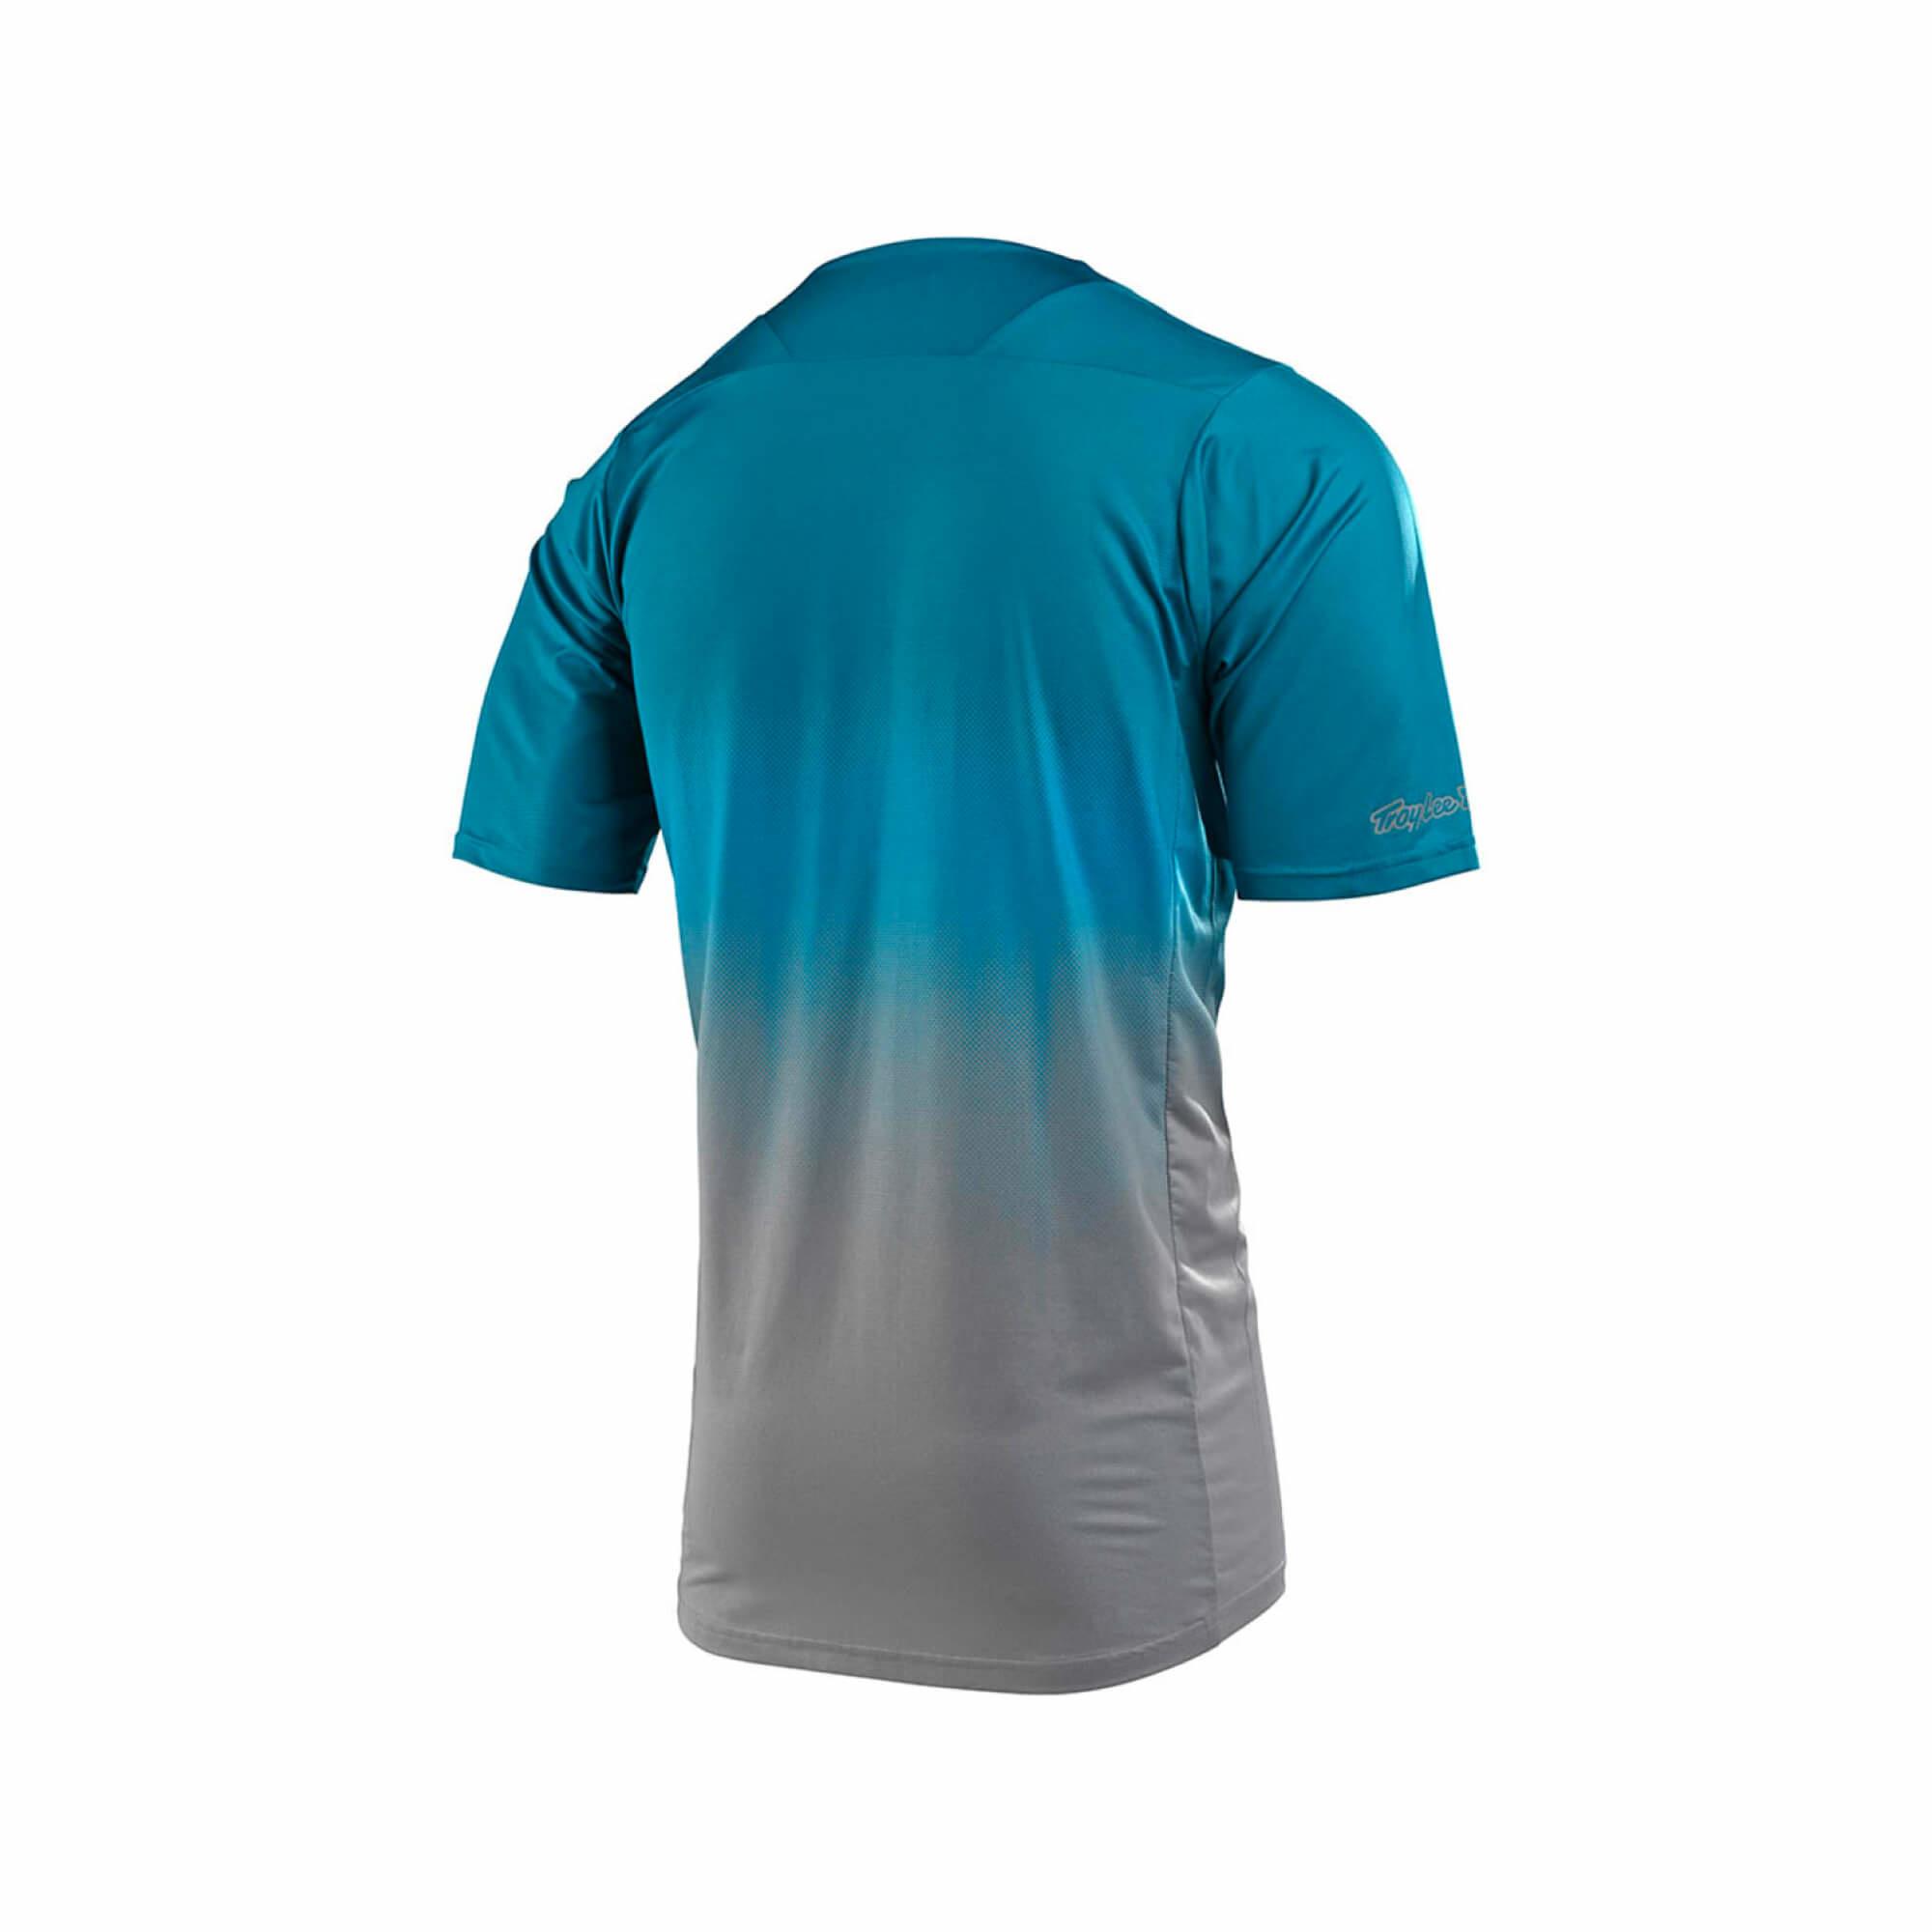 Skyline Short Sleeve Jersey 2020-2